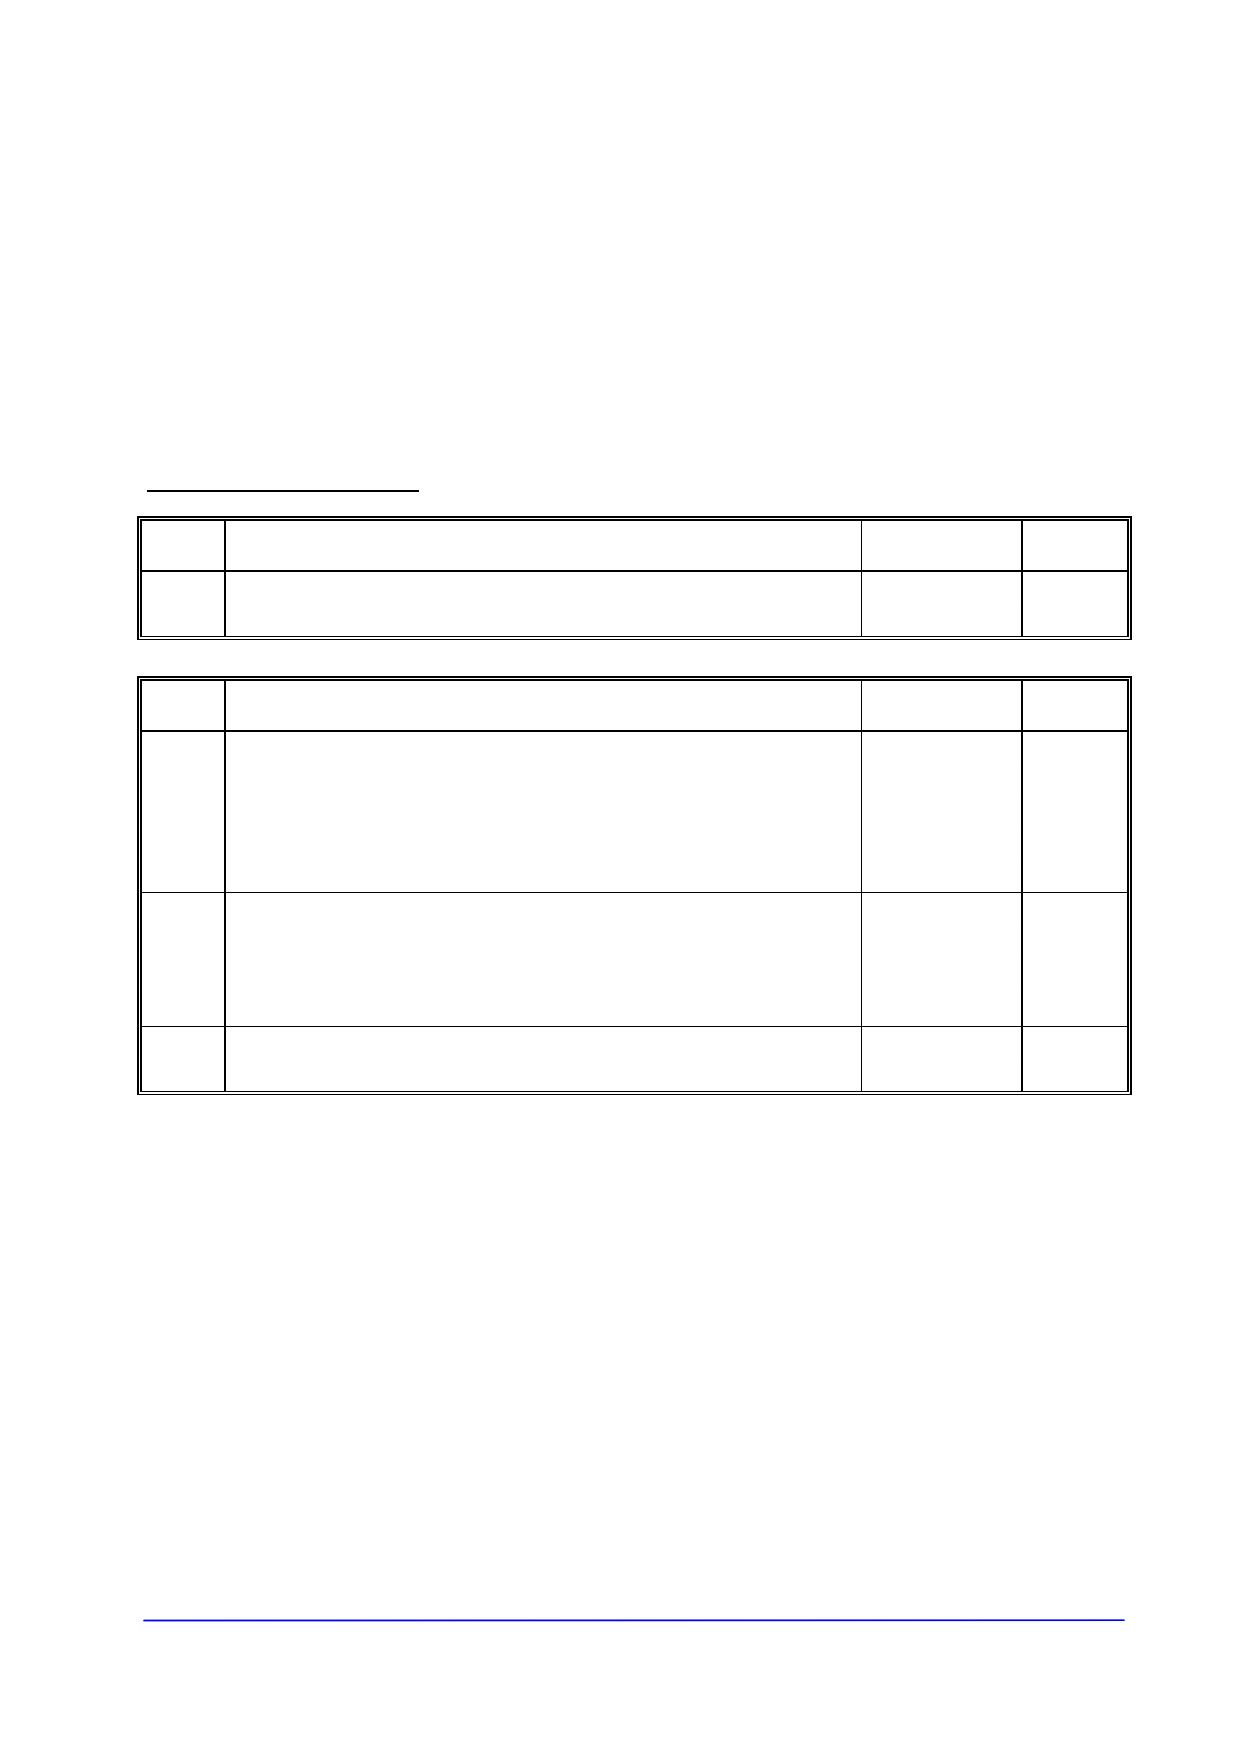 M0588LC400 دیتاشیت PDF